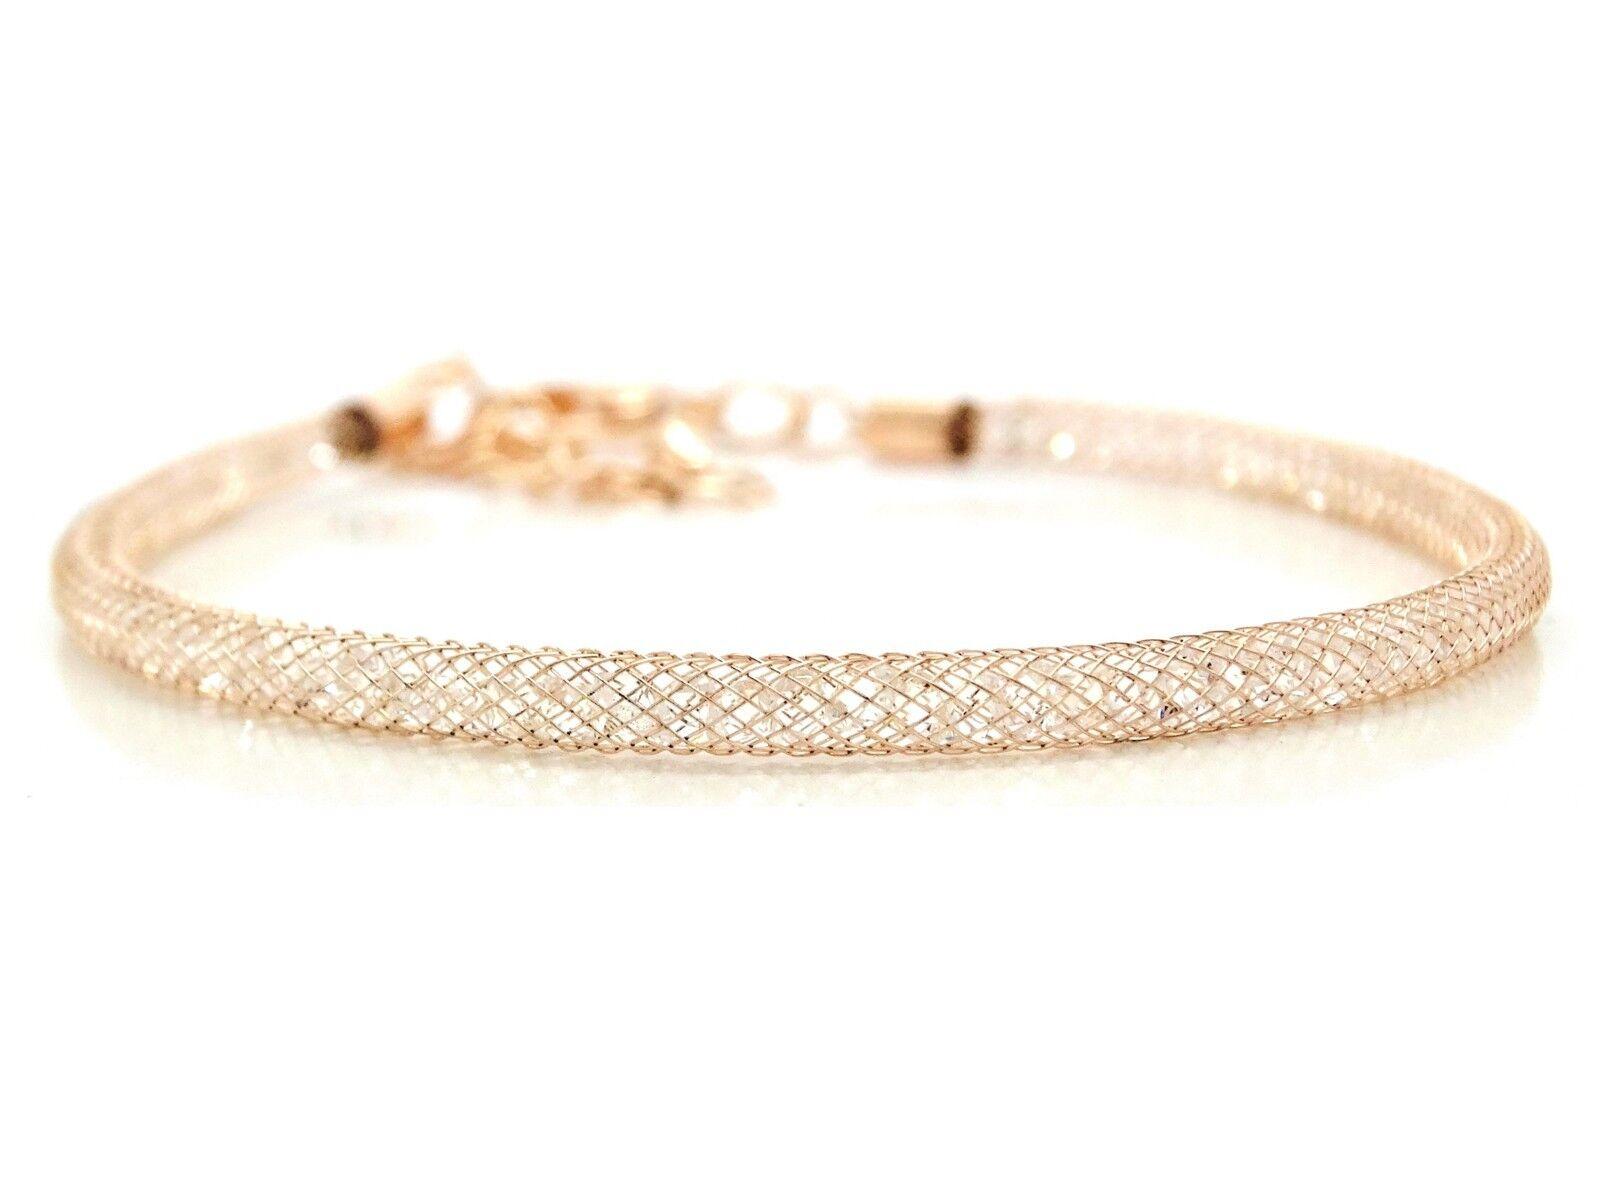 Authentic yellow gold plated mesh bracelet sparkling white gems inside gift bag